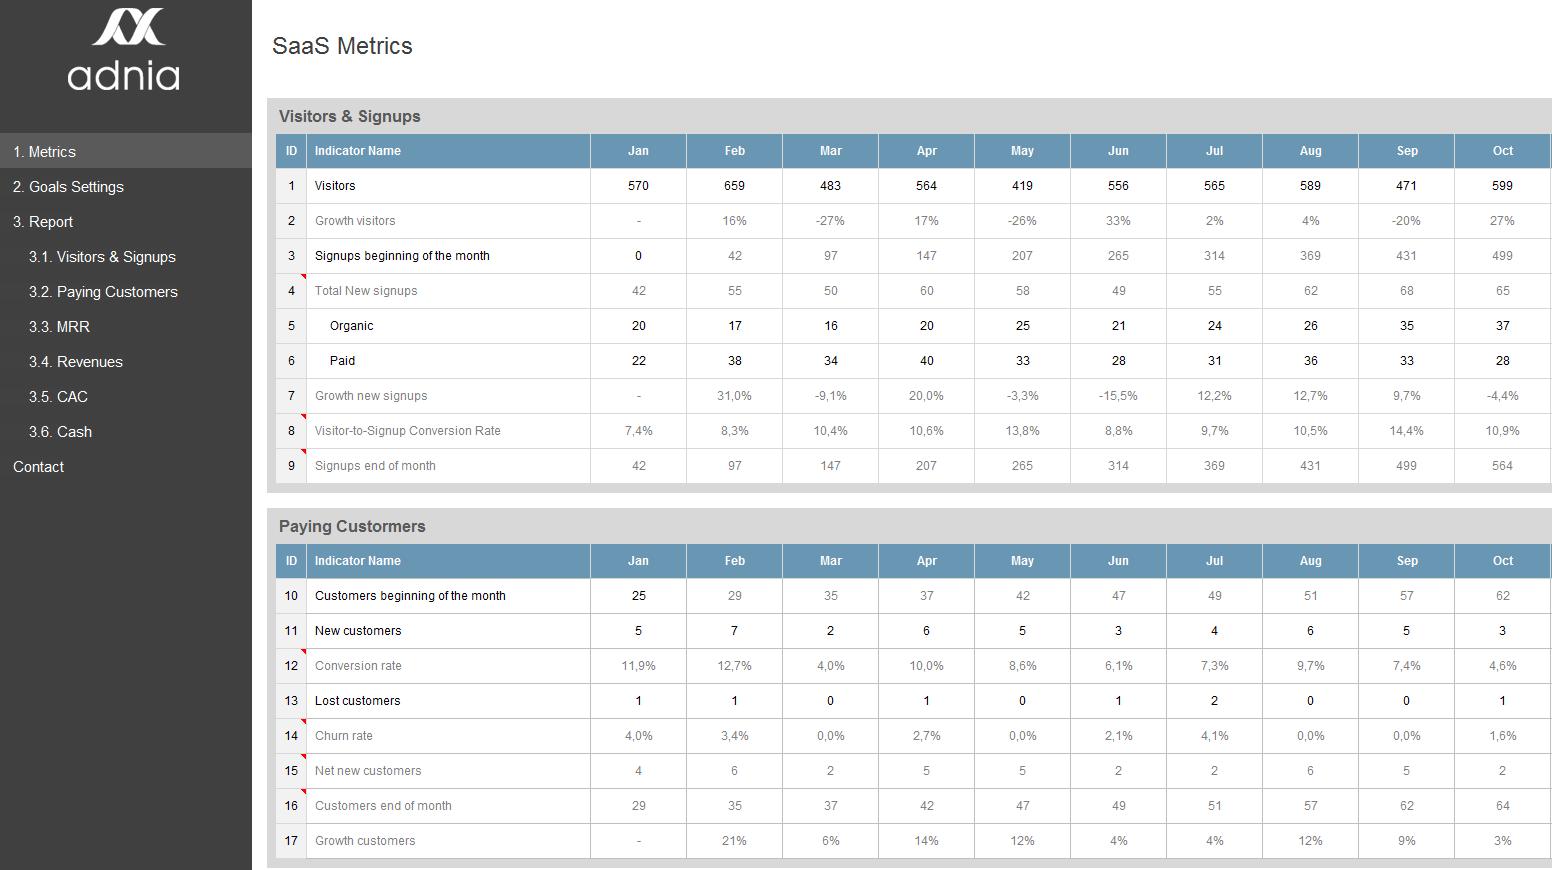 saas metrics template saas metrics dashboard template adnia solutions. Black Bedroom Furniture Sets. Home Design Ideas